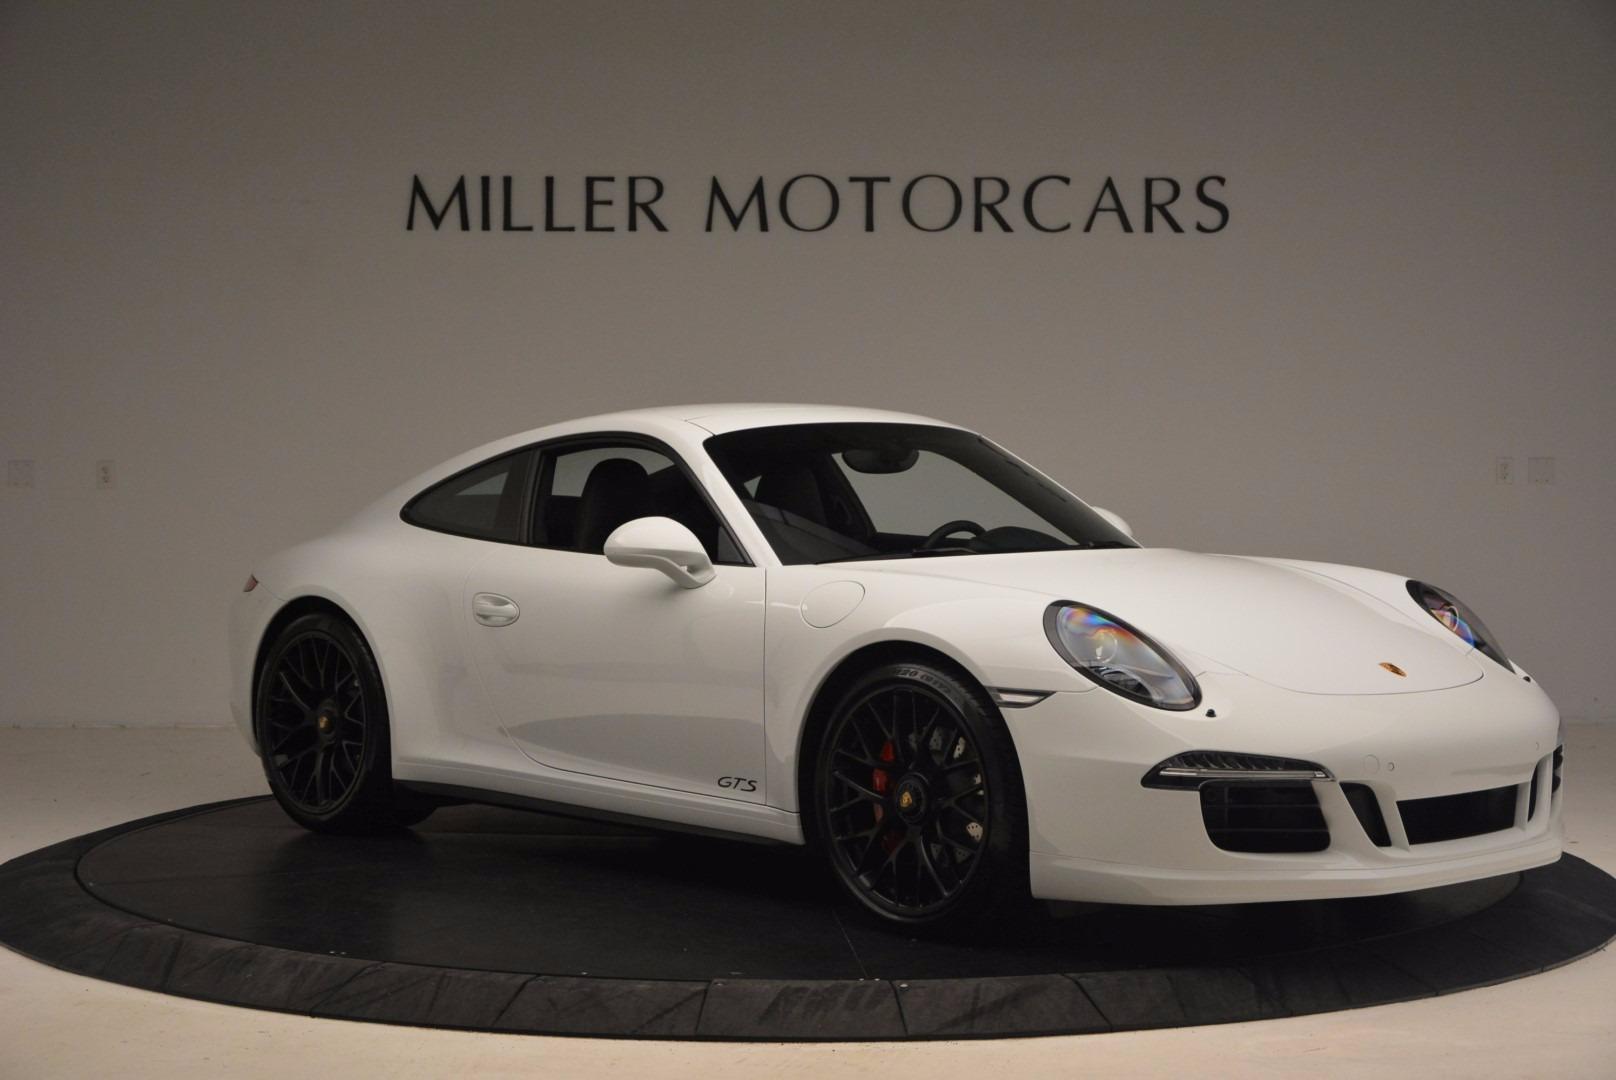 Used 2015 Porsche 911 Carrera GTS For Sale In Greenwich, CT 1444_p11